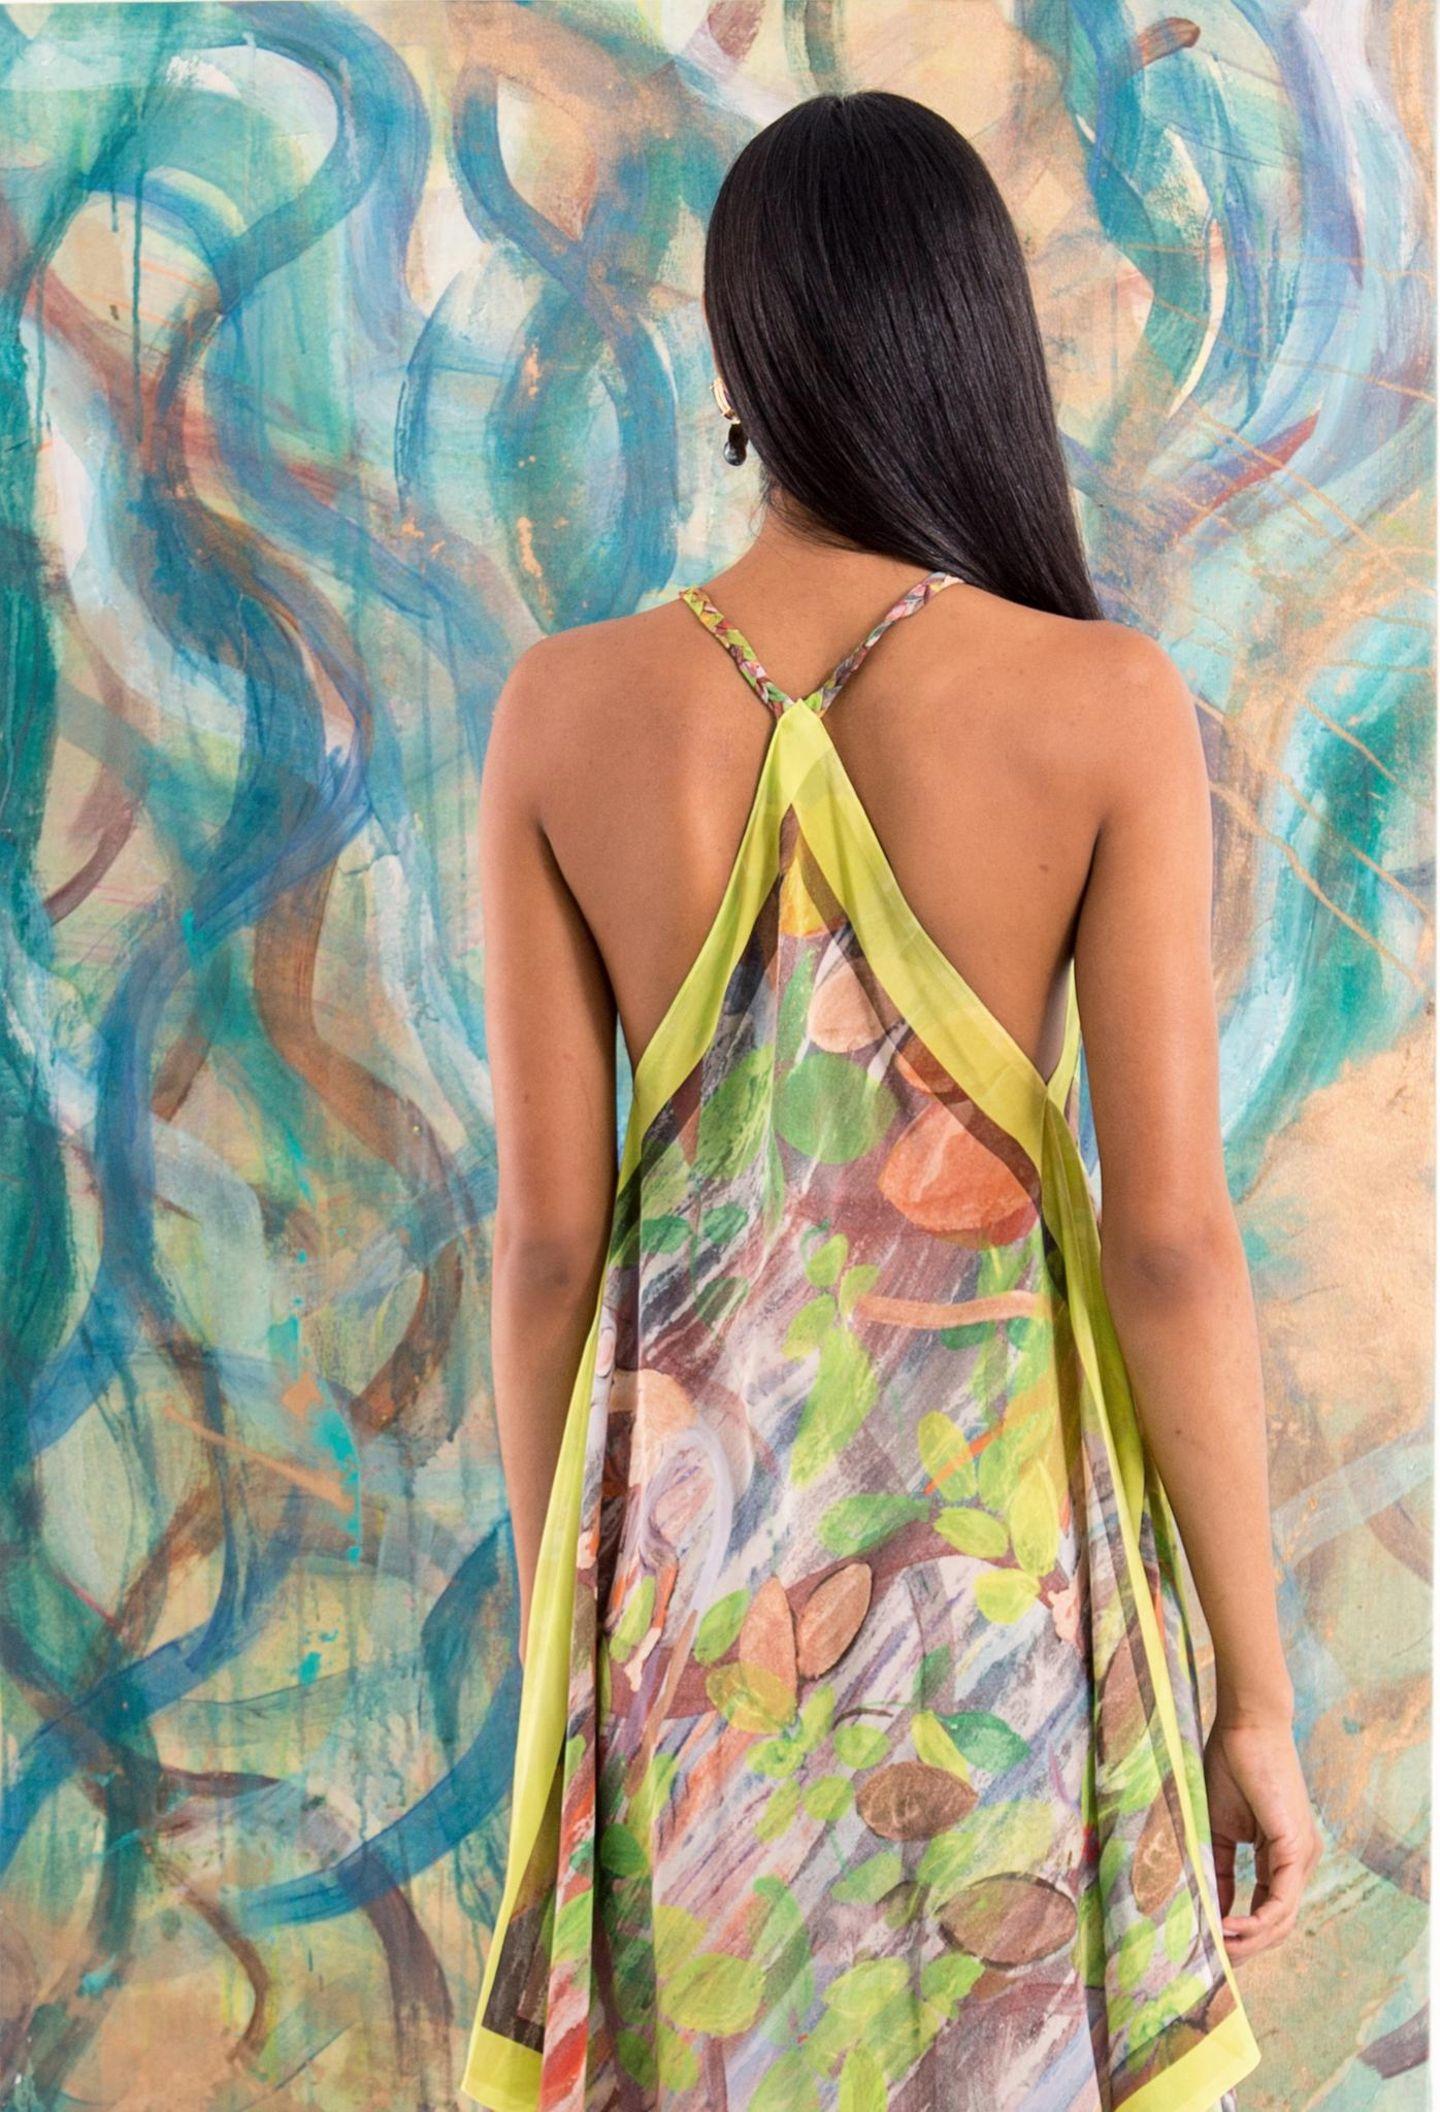 Muster: Kleid mit abstraktem Print vor Gemälde